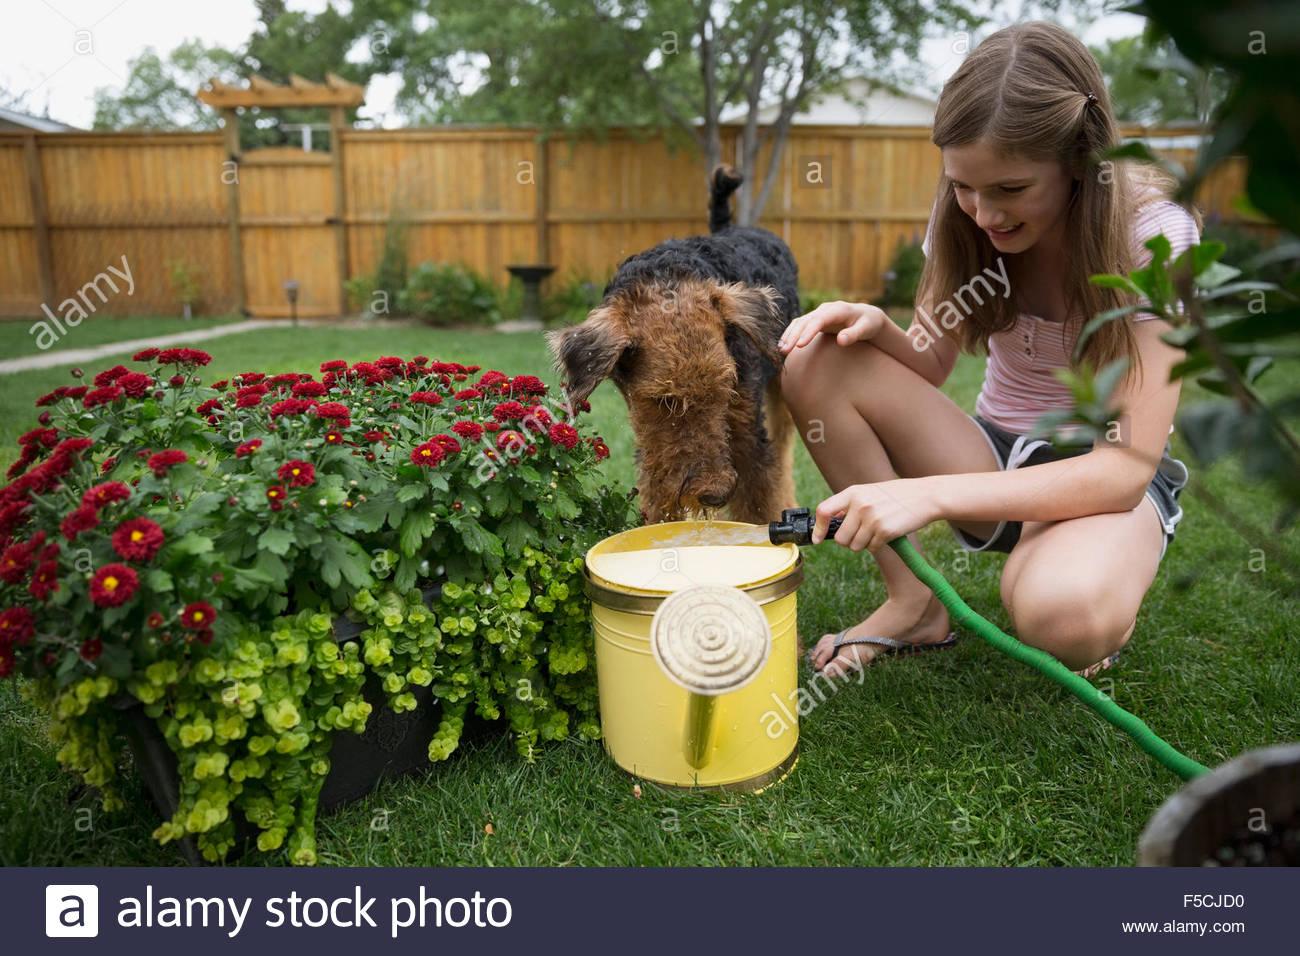 Hund beobachten Mädchen Füllung Gießkanne im Hinterhof Stockbild